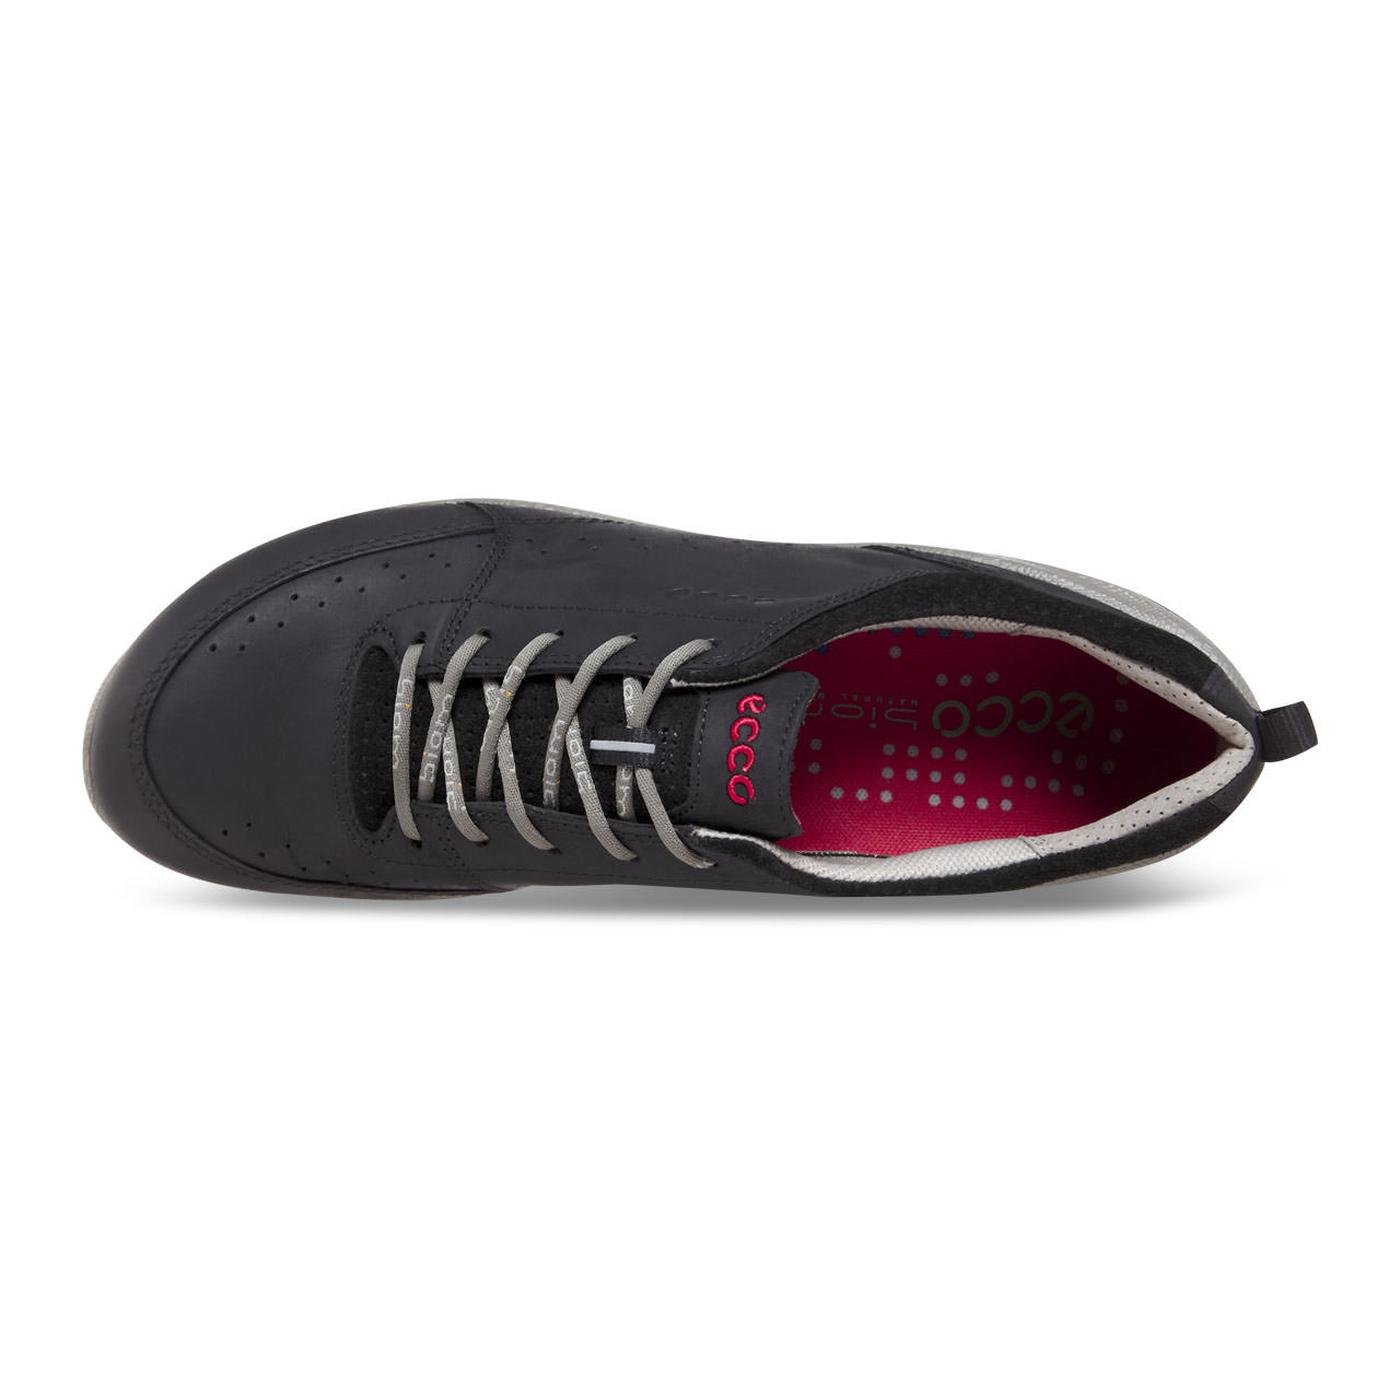 ECCO BIOM LITE MENS Sneaker